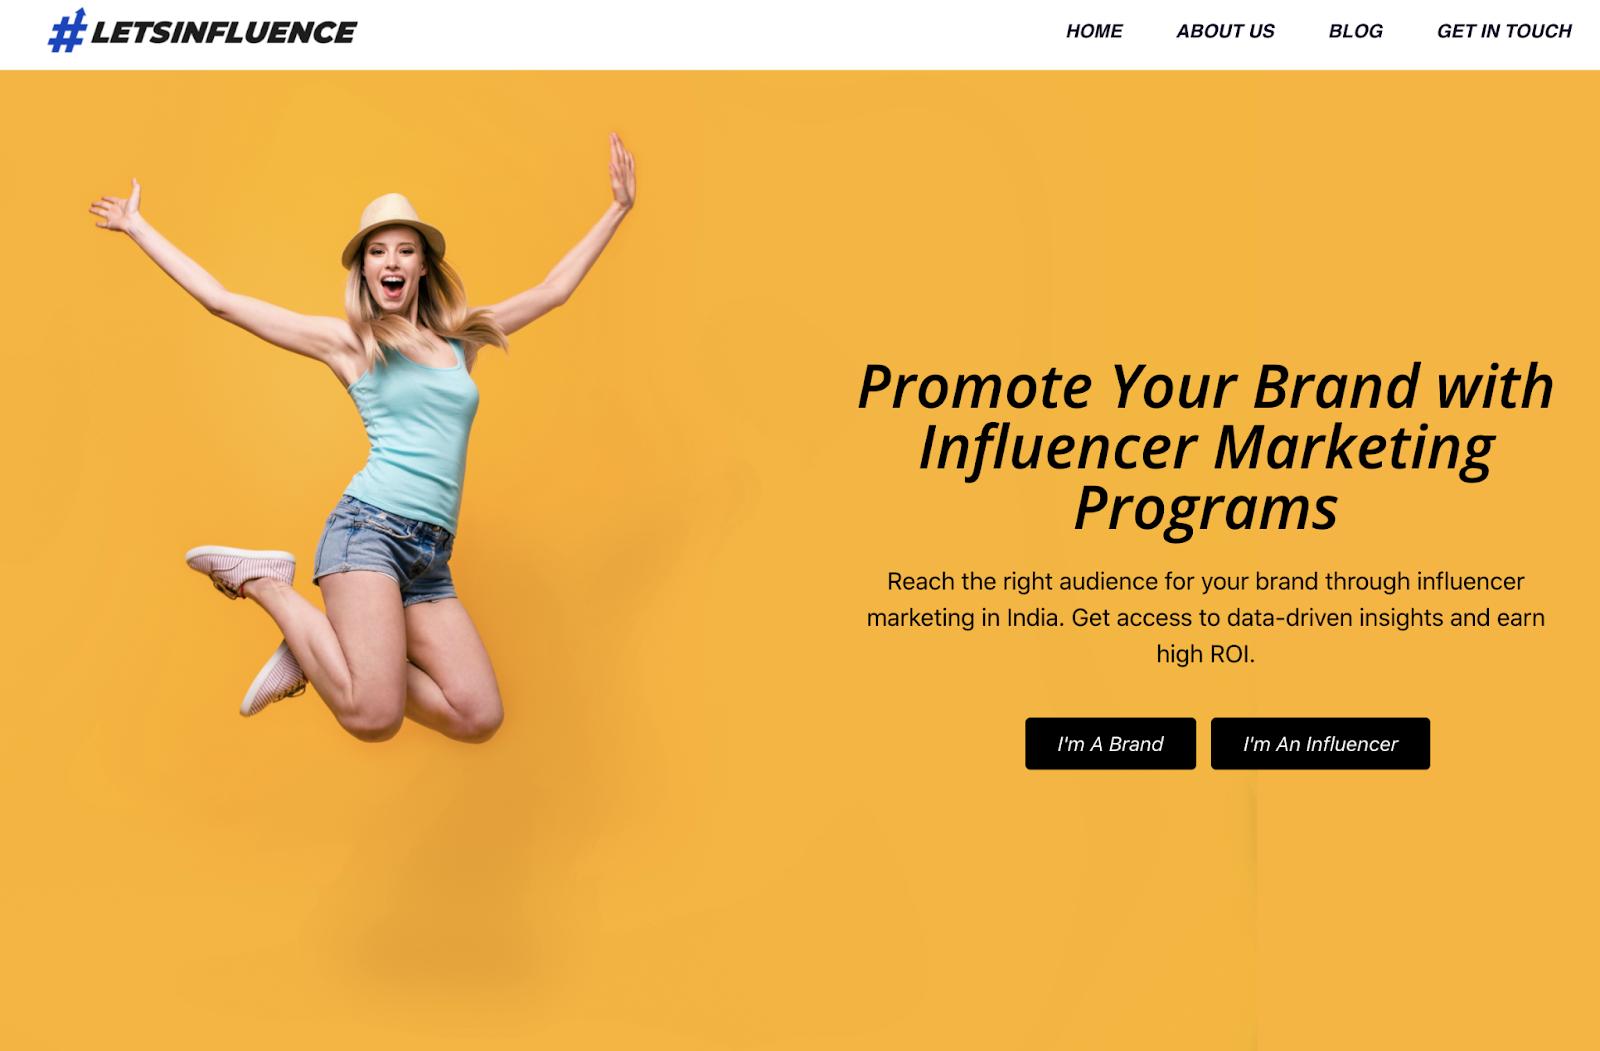 Let's Influence influencer marketing program